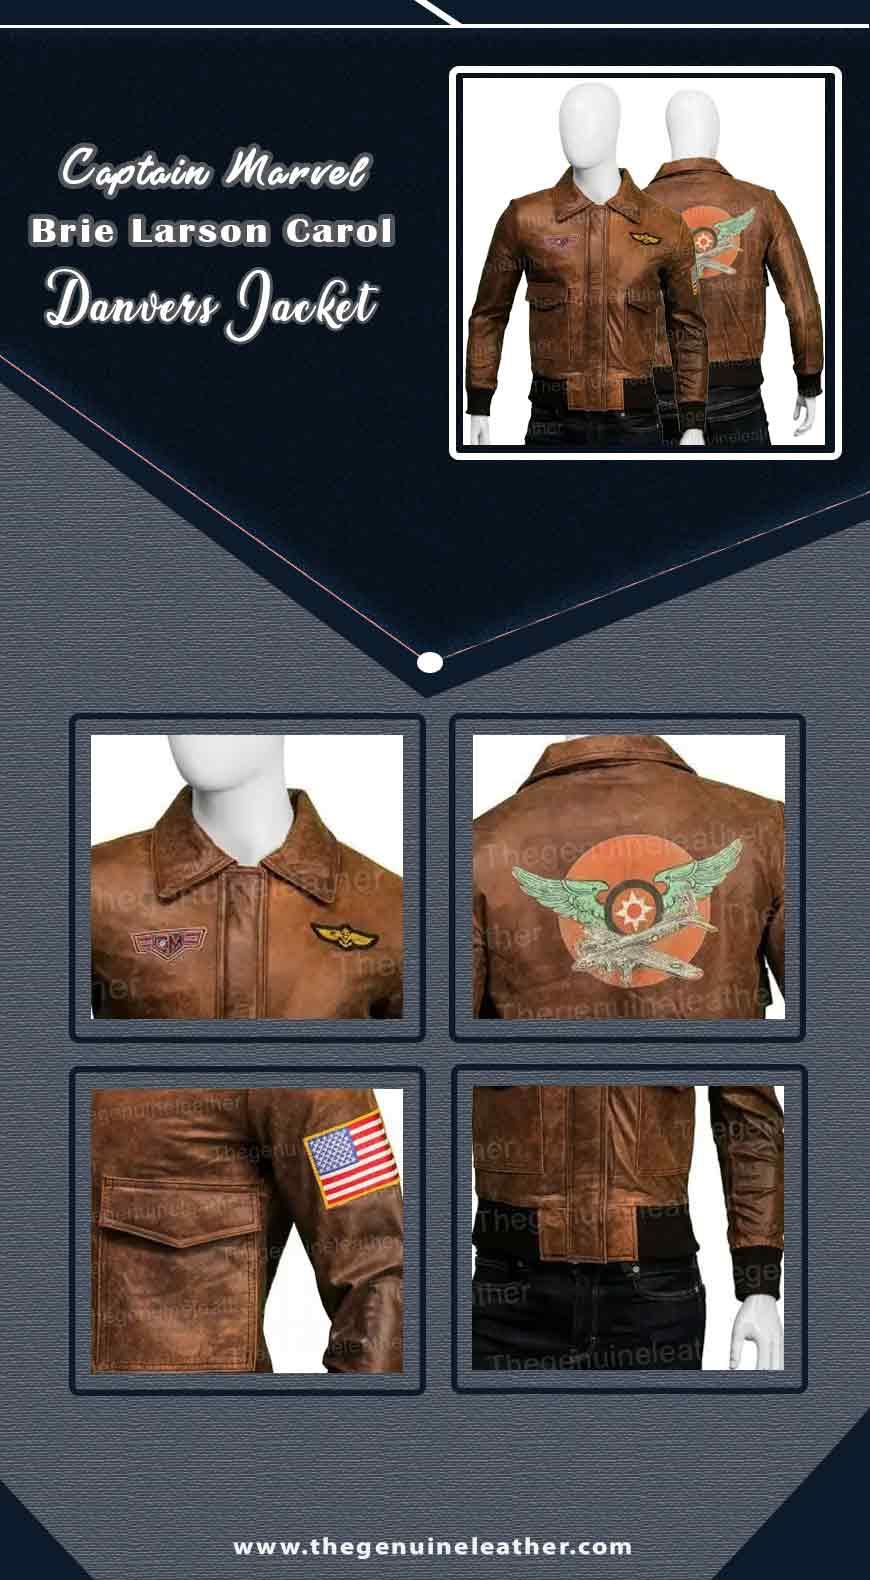 Captain Marvel Brie Larson Carol Danvers Jacket info